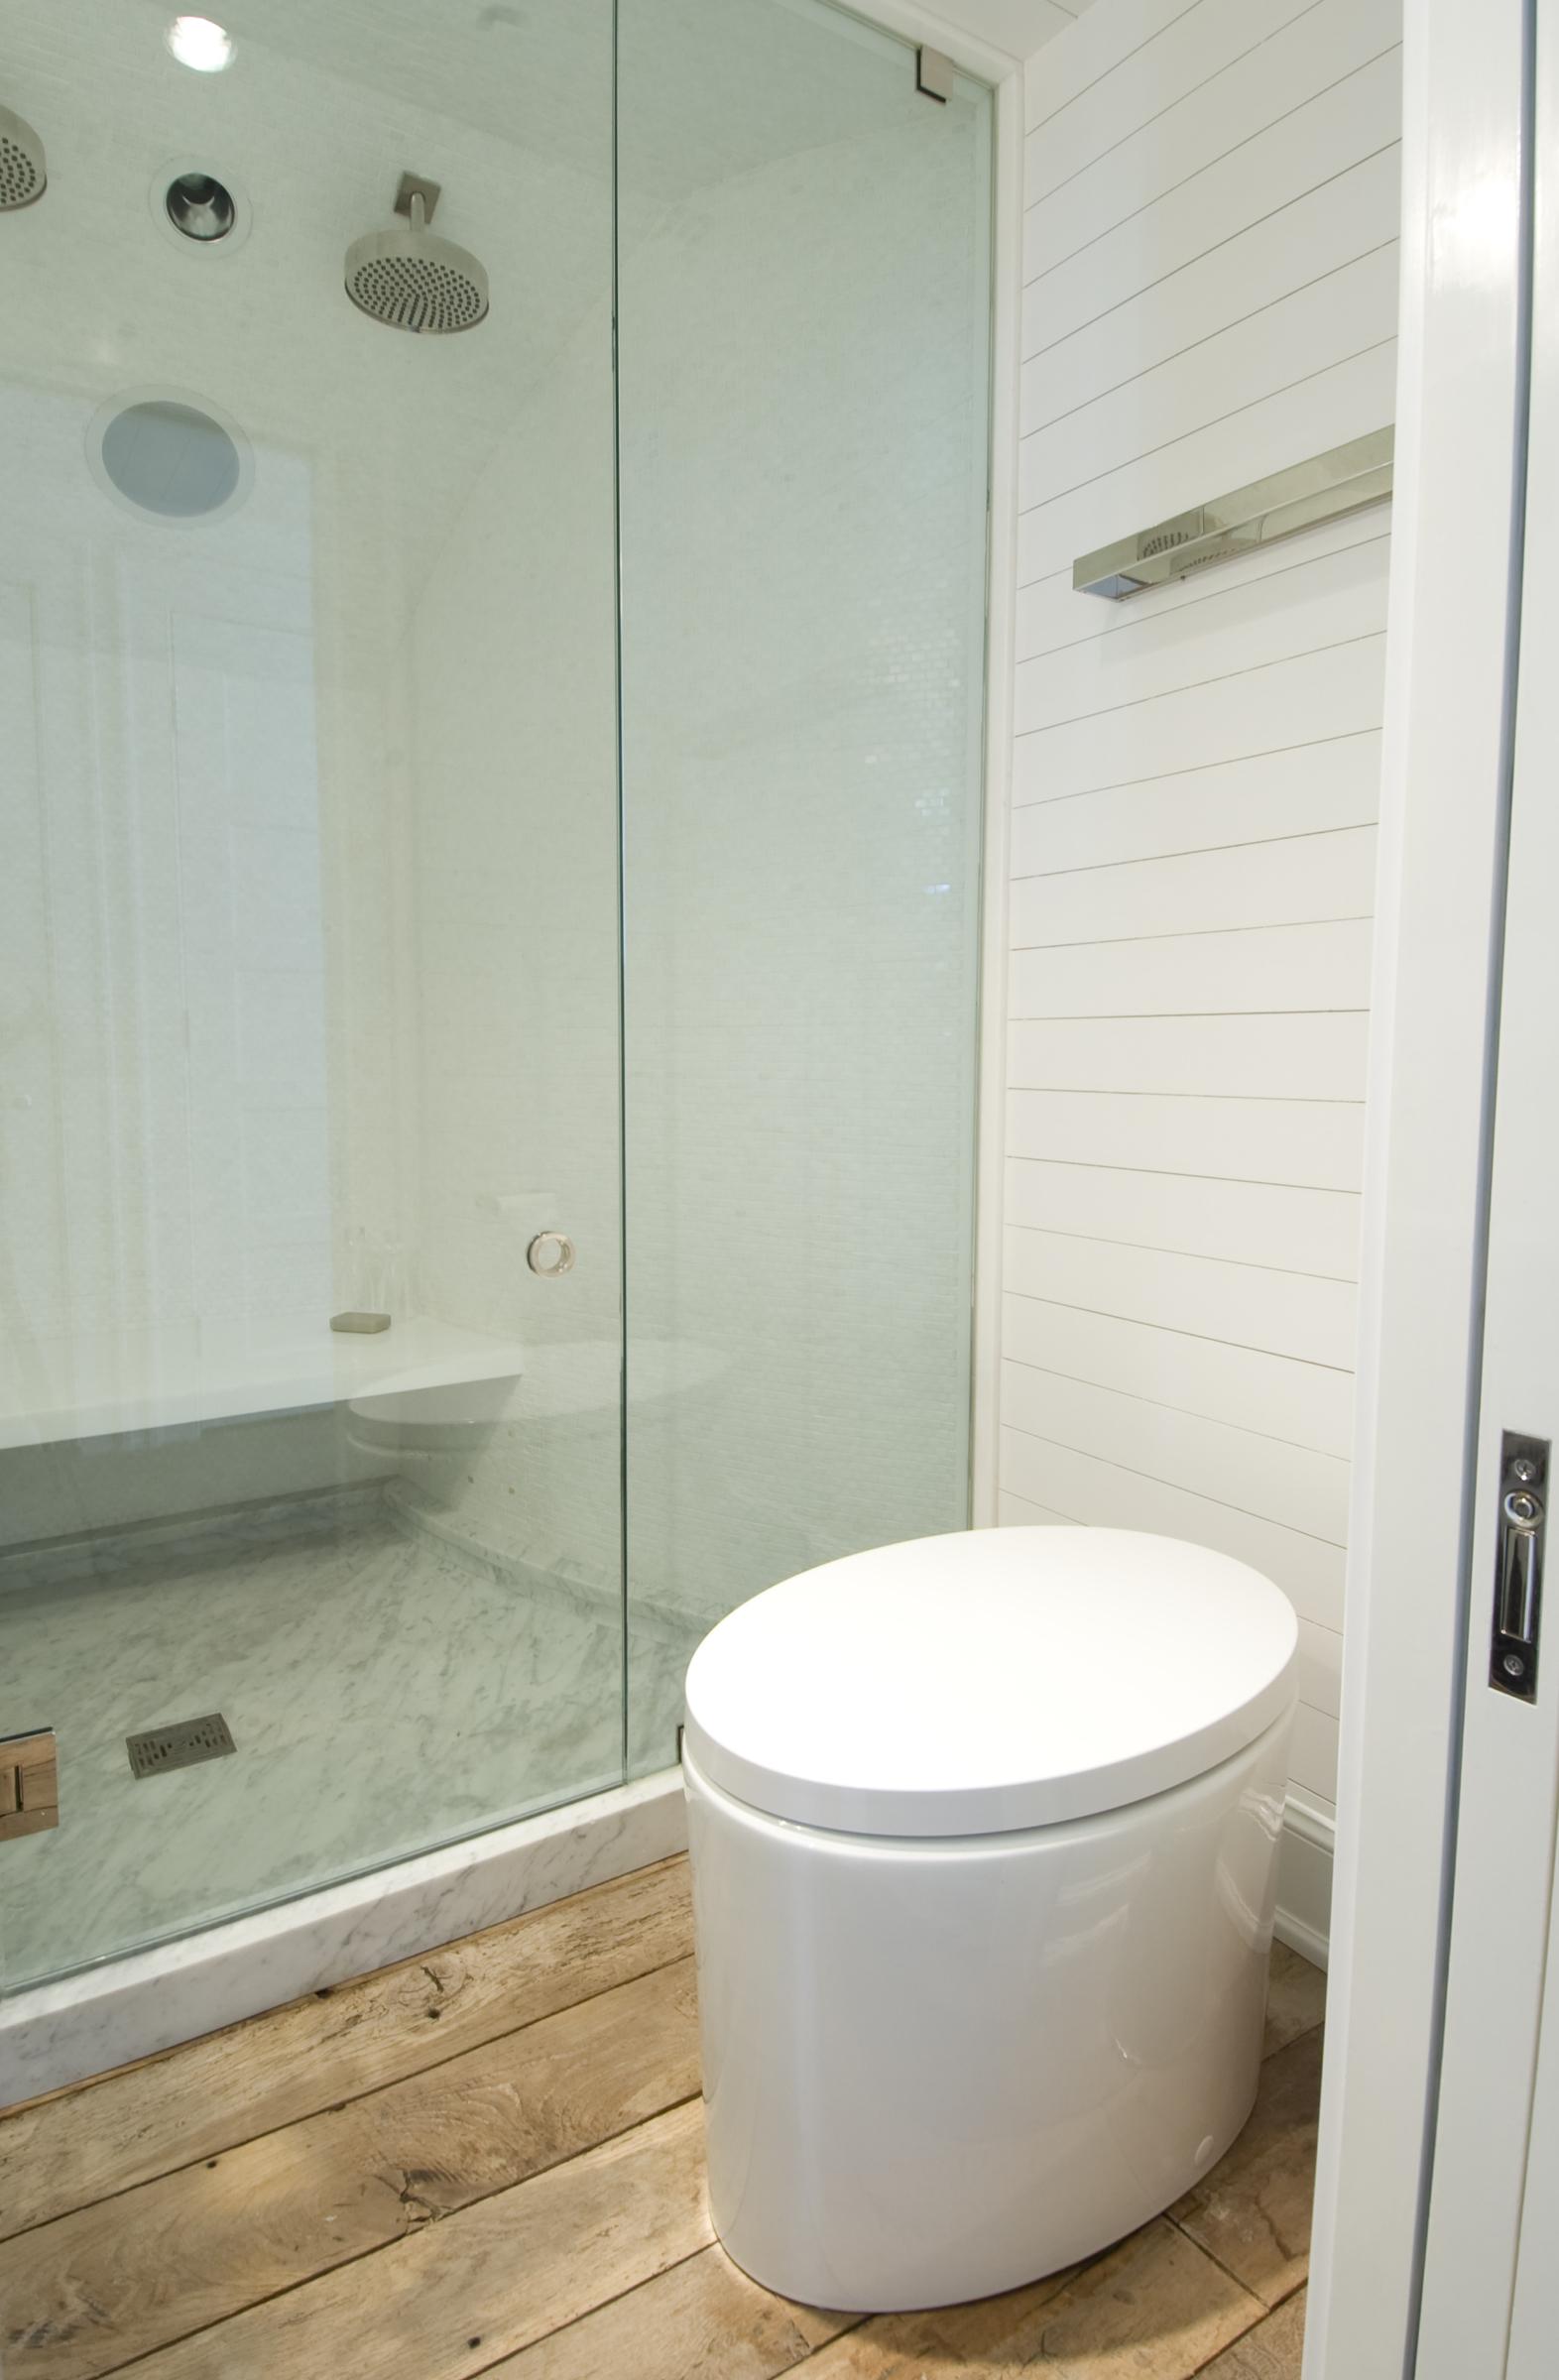 3rd floor bath7720.jpg